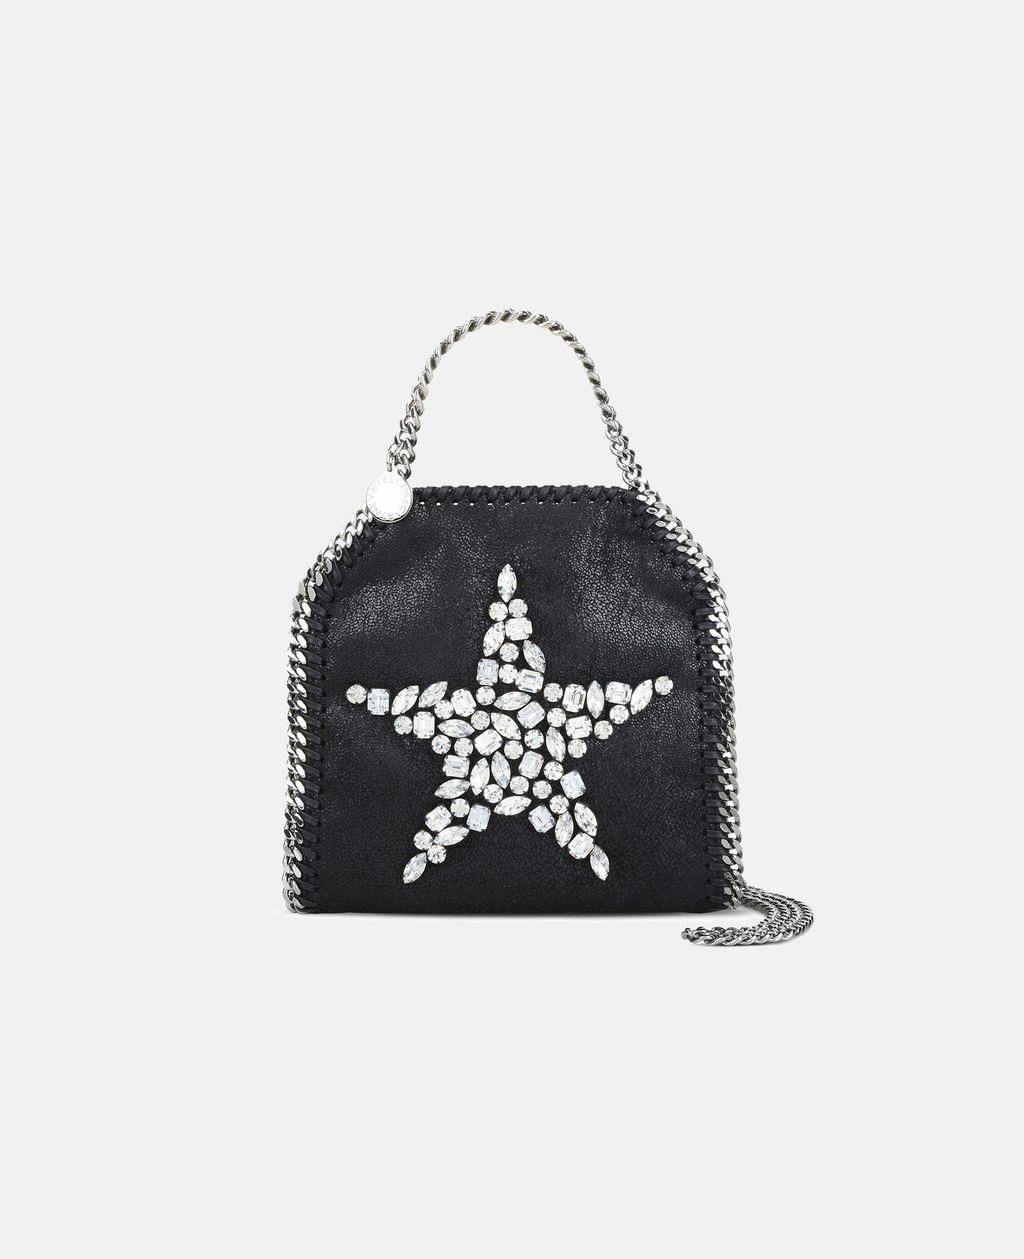 Black Falabella Crystal Stones Star Tiny Tote - STELLA MCCARTNEY